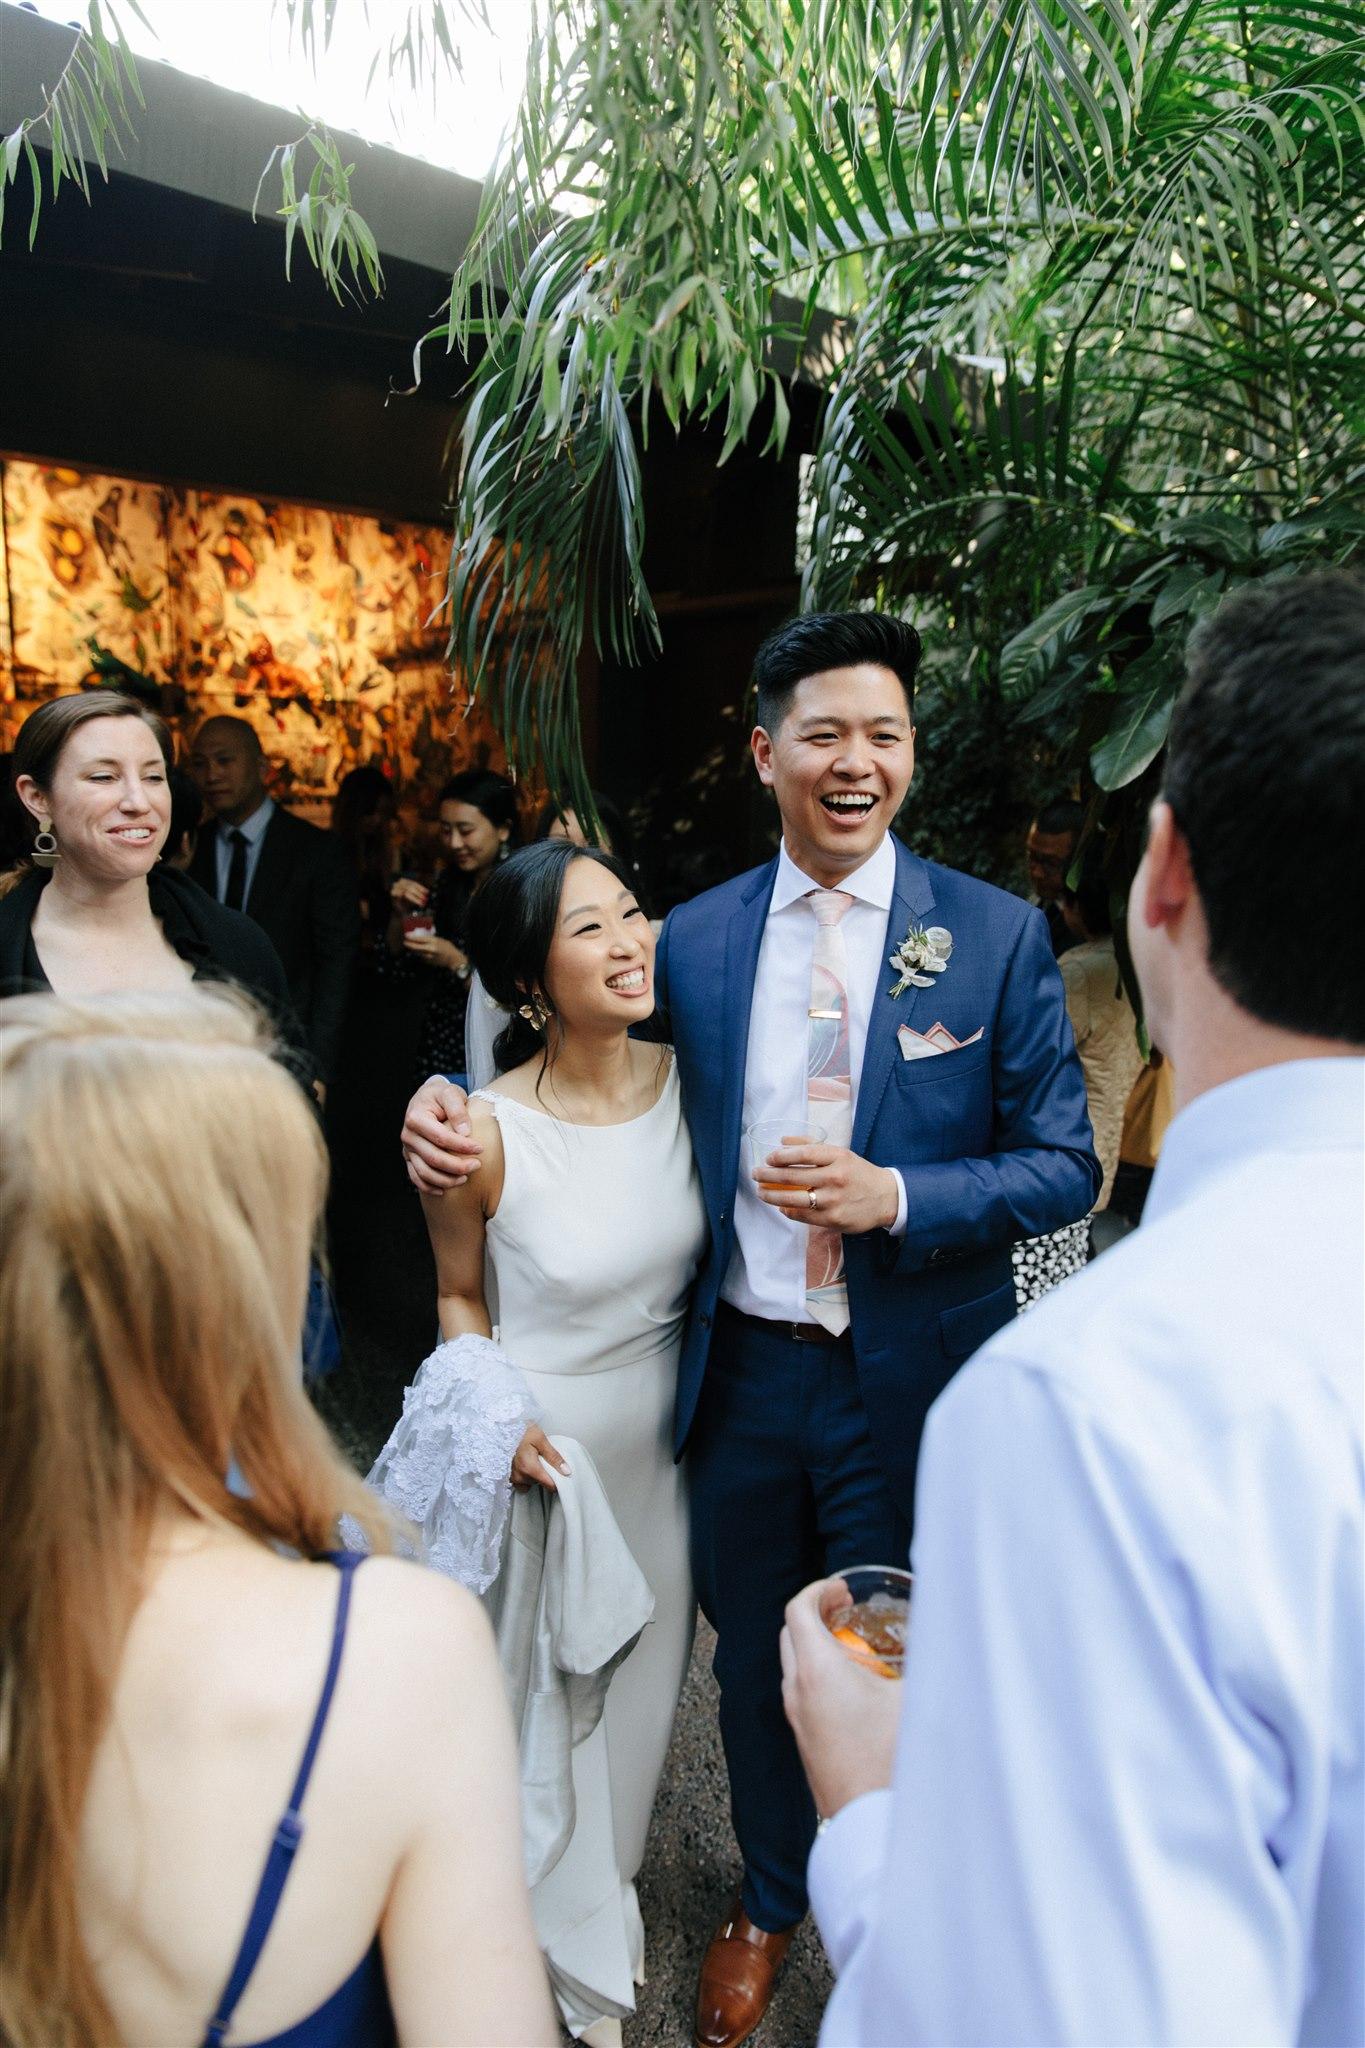 Millwick_Wedding_Judyth_and_Mike-prints-792.jpg